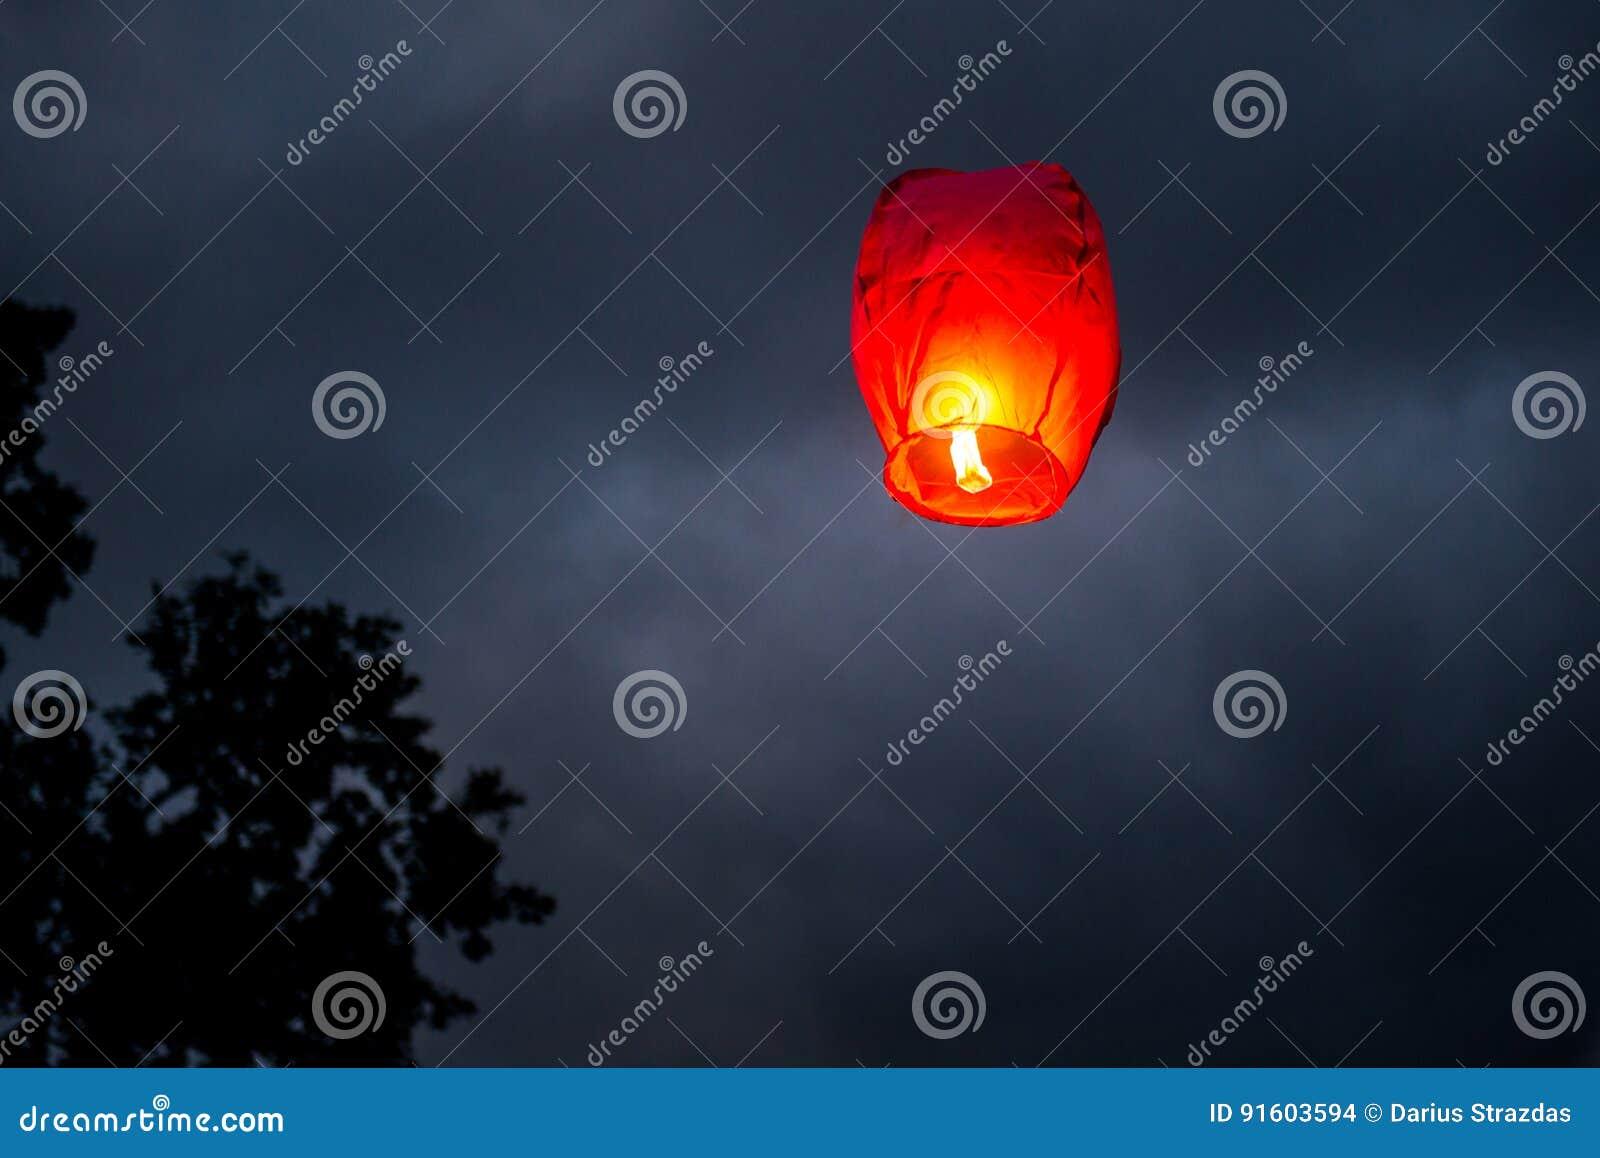 One Chinese Lantern